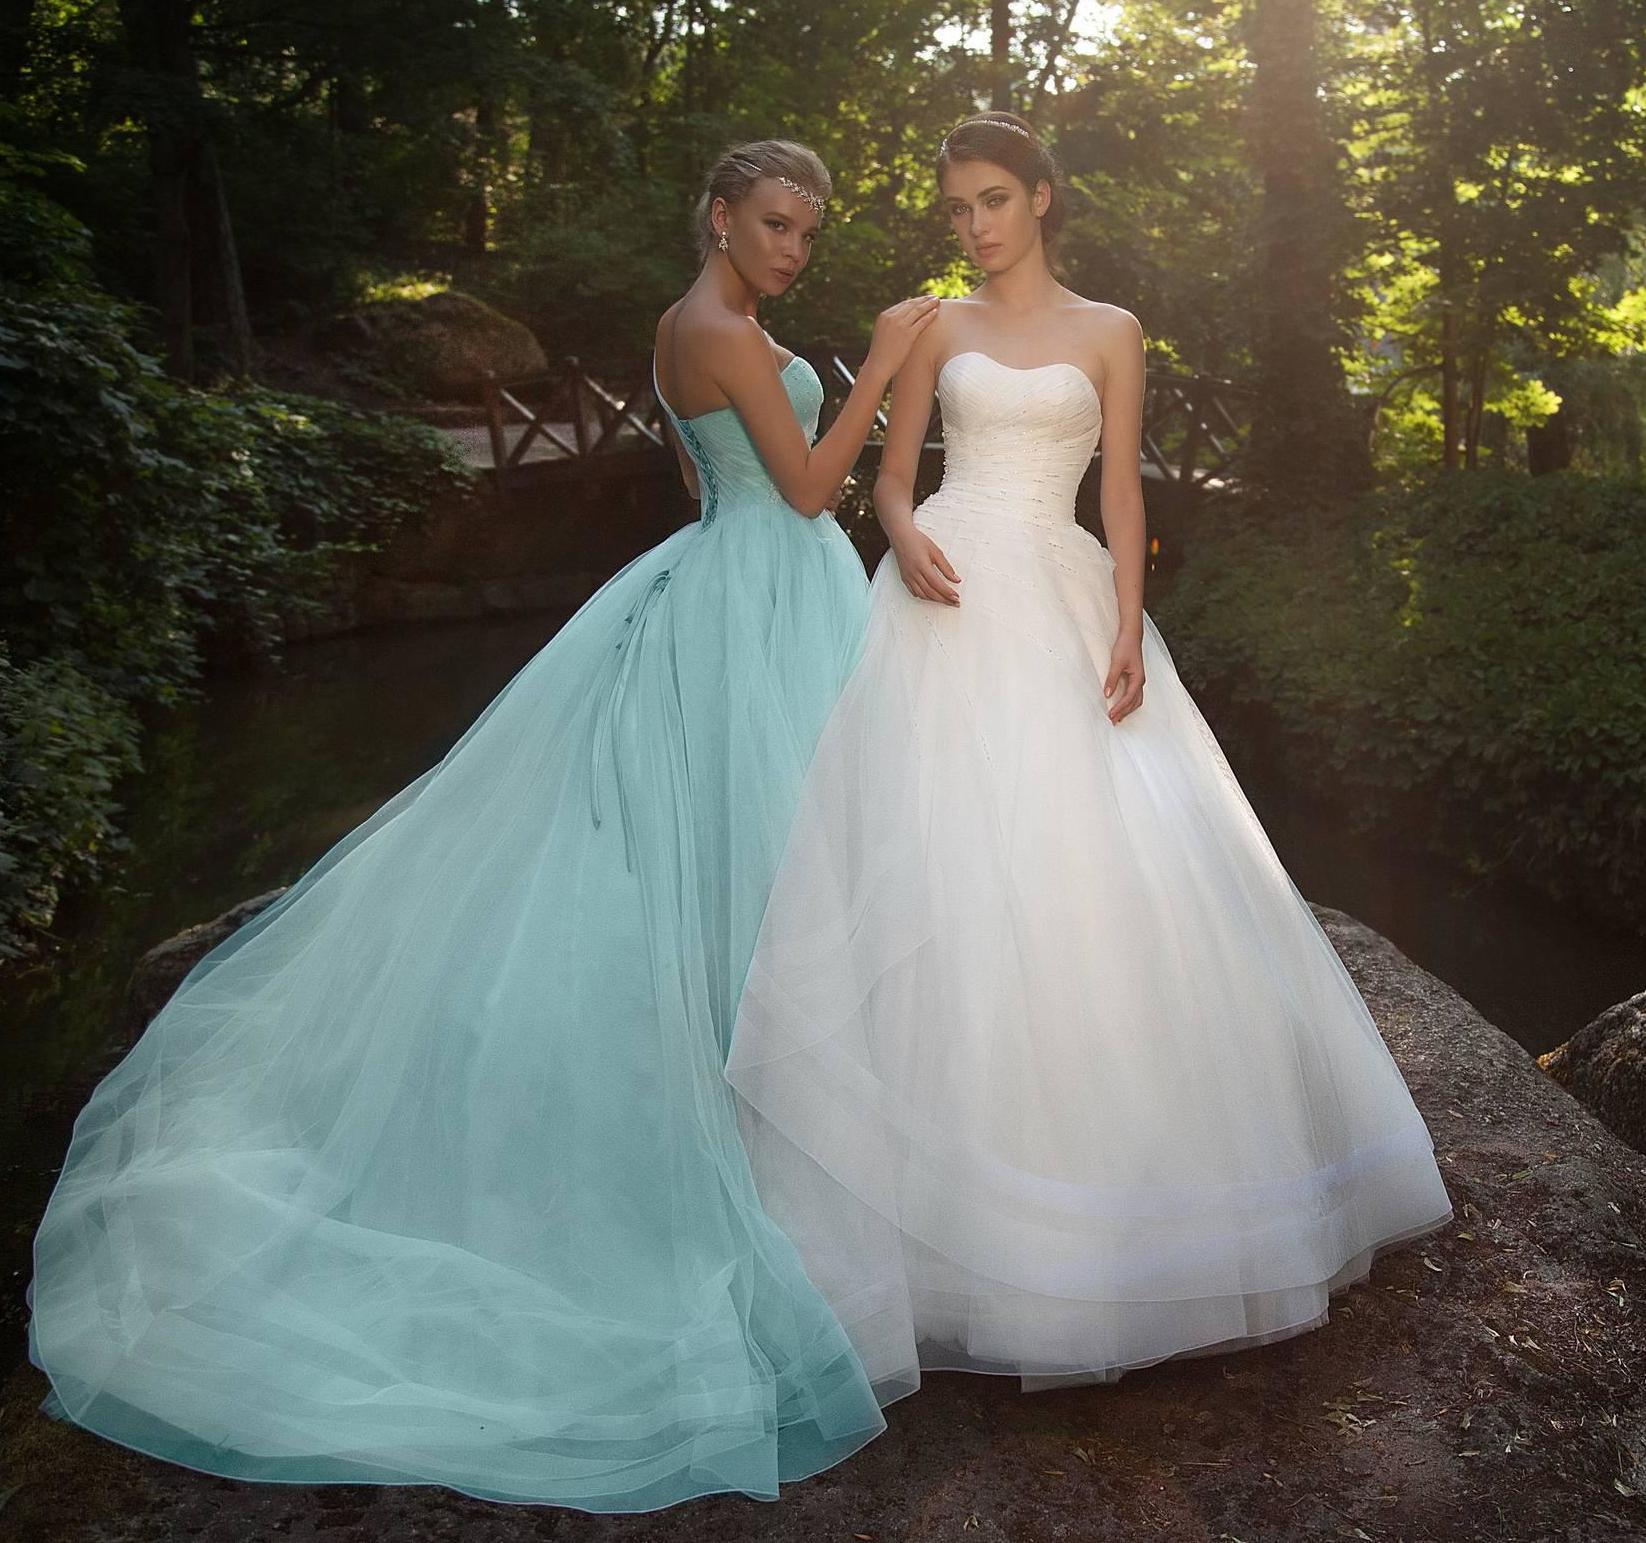 Awesome Bernadette Wedding Dress Inspiration - All Wedding Dresses ...